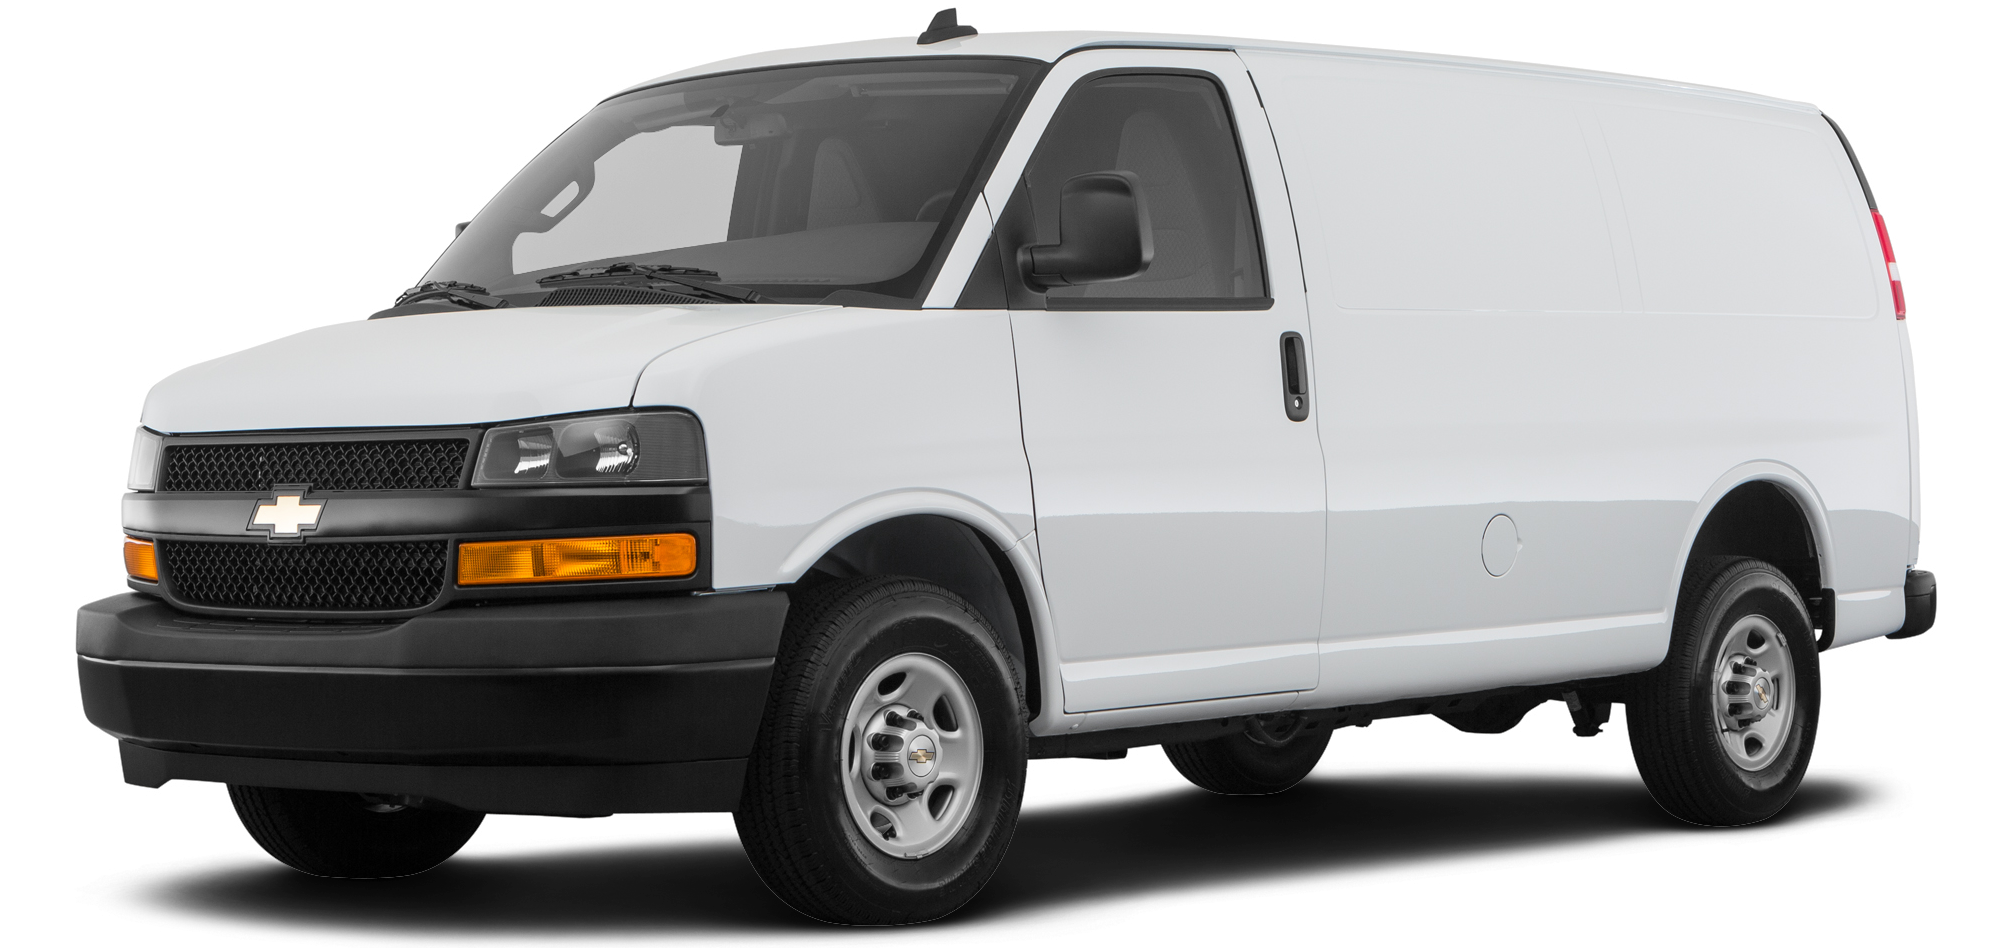 Chevrolet Express Van >> 2019 Chevrolet Express 2500 Incentives, Specials & Offers